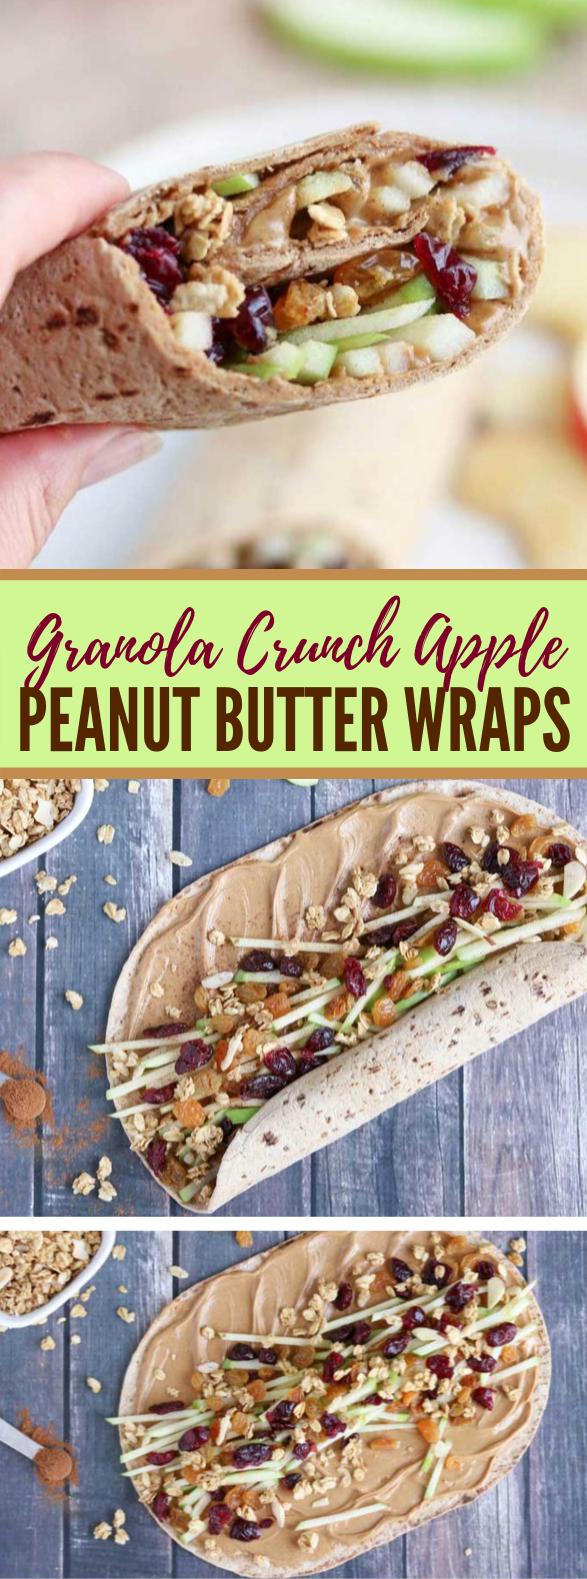 Granola Crunch Apple-Peanut Butter Sandwich Wraps #healthy #lunch